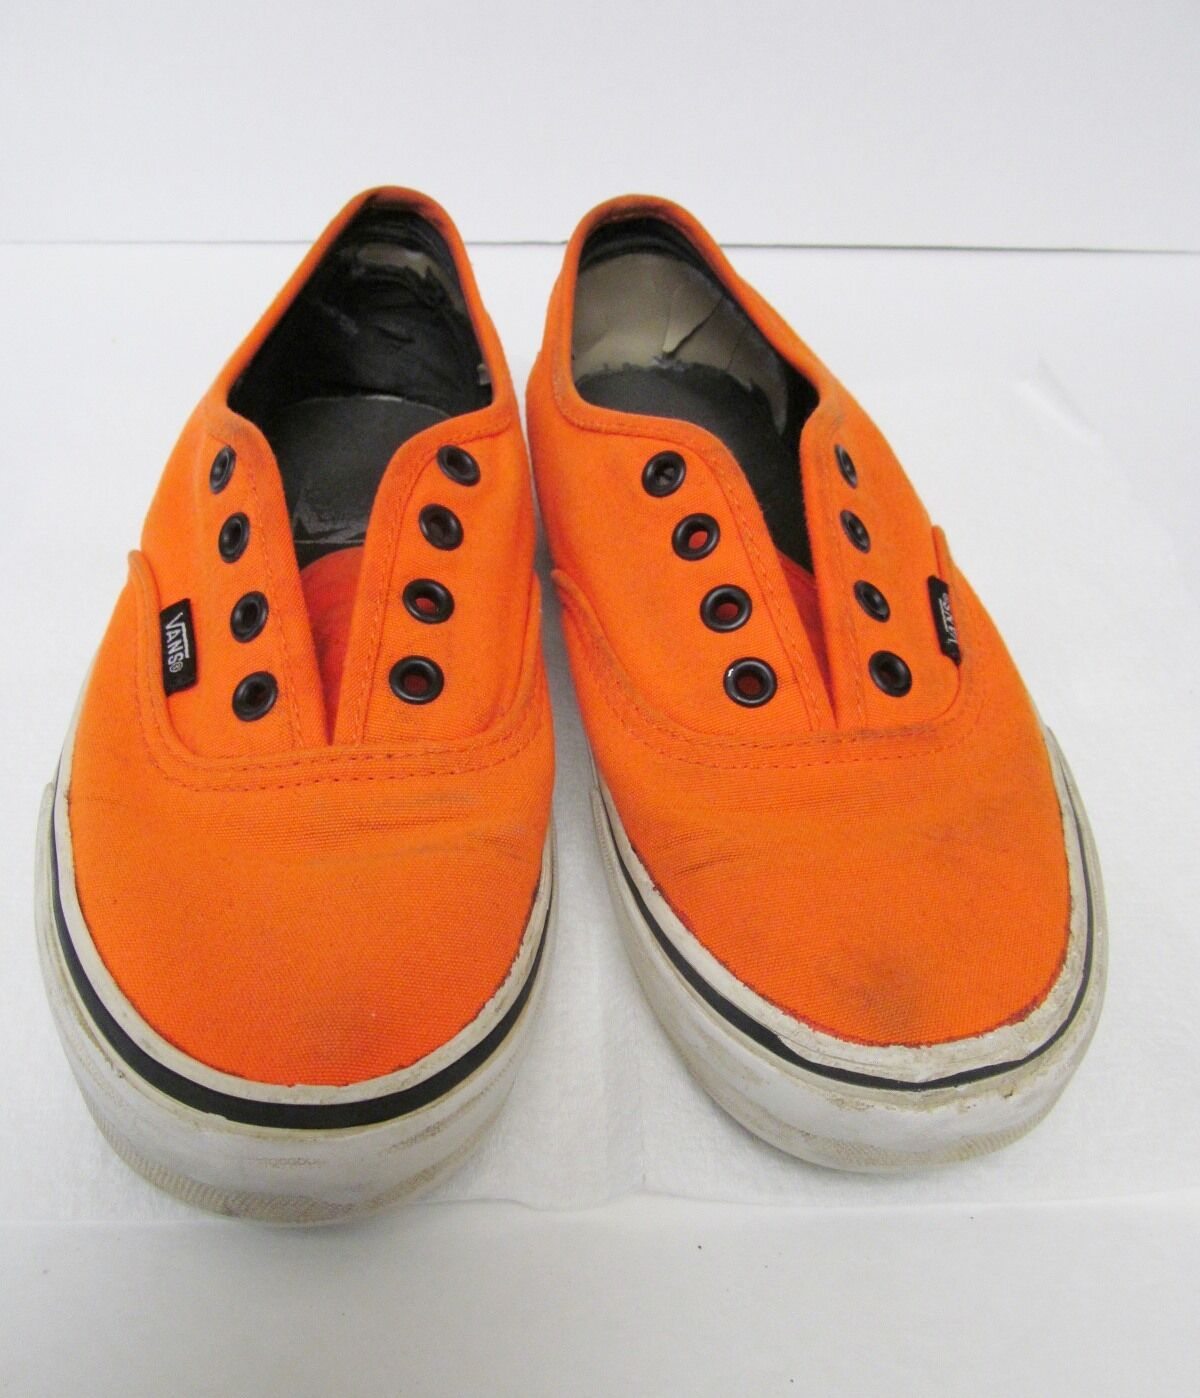 Vans Off the Wall Distressed Athletic Sneakers orange Canvas Men's US 6.0 VTG